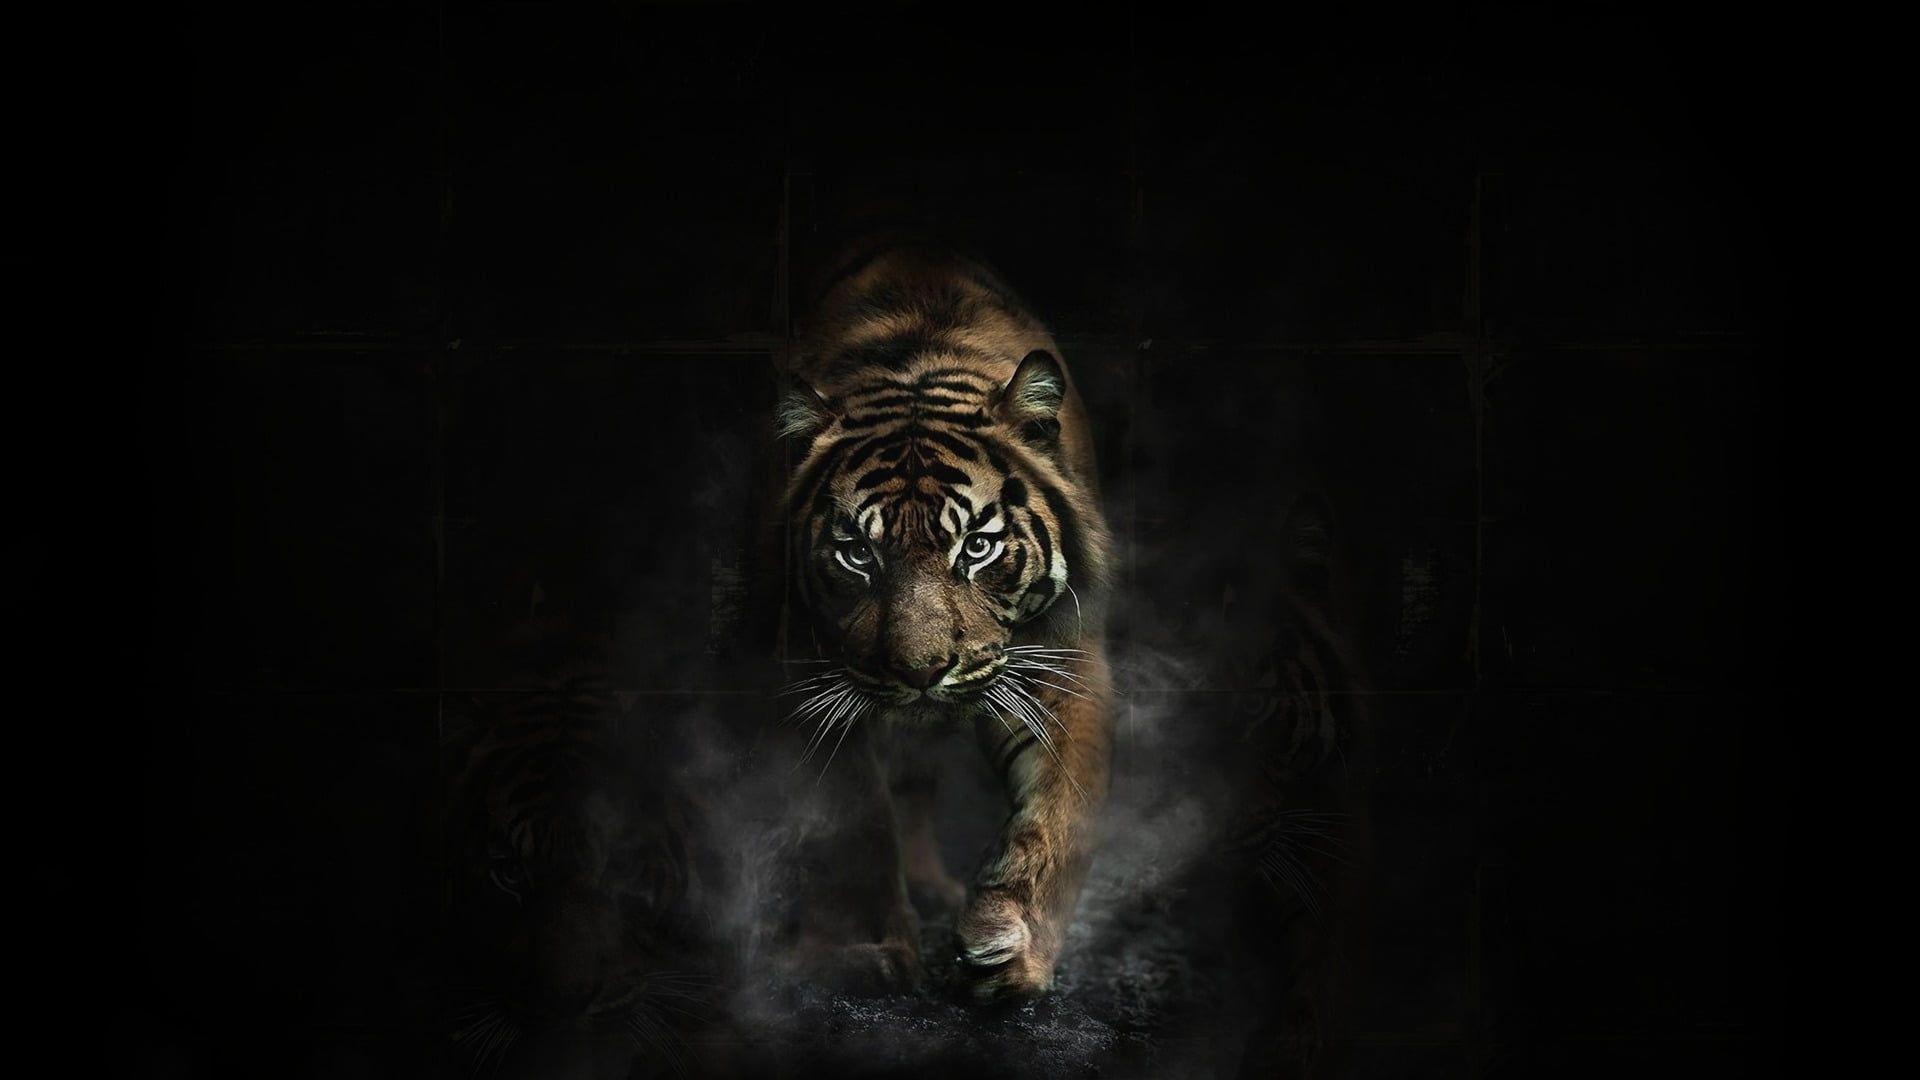 Adult Brown Tiger Tiger Animals Dark Artwork 1080p Wallpaper Hdwallpaper Desktop In 2020 Tiger Images Pet Tiger Animal Theme